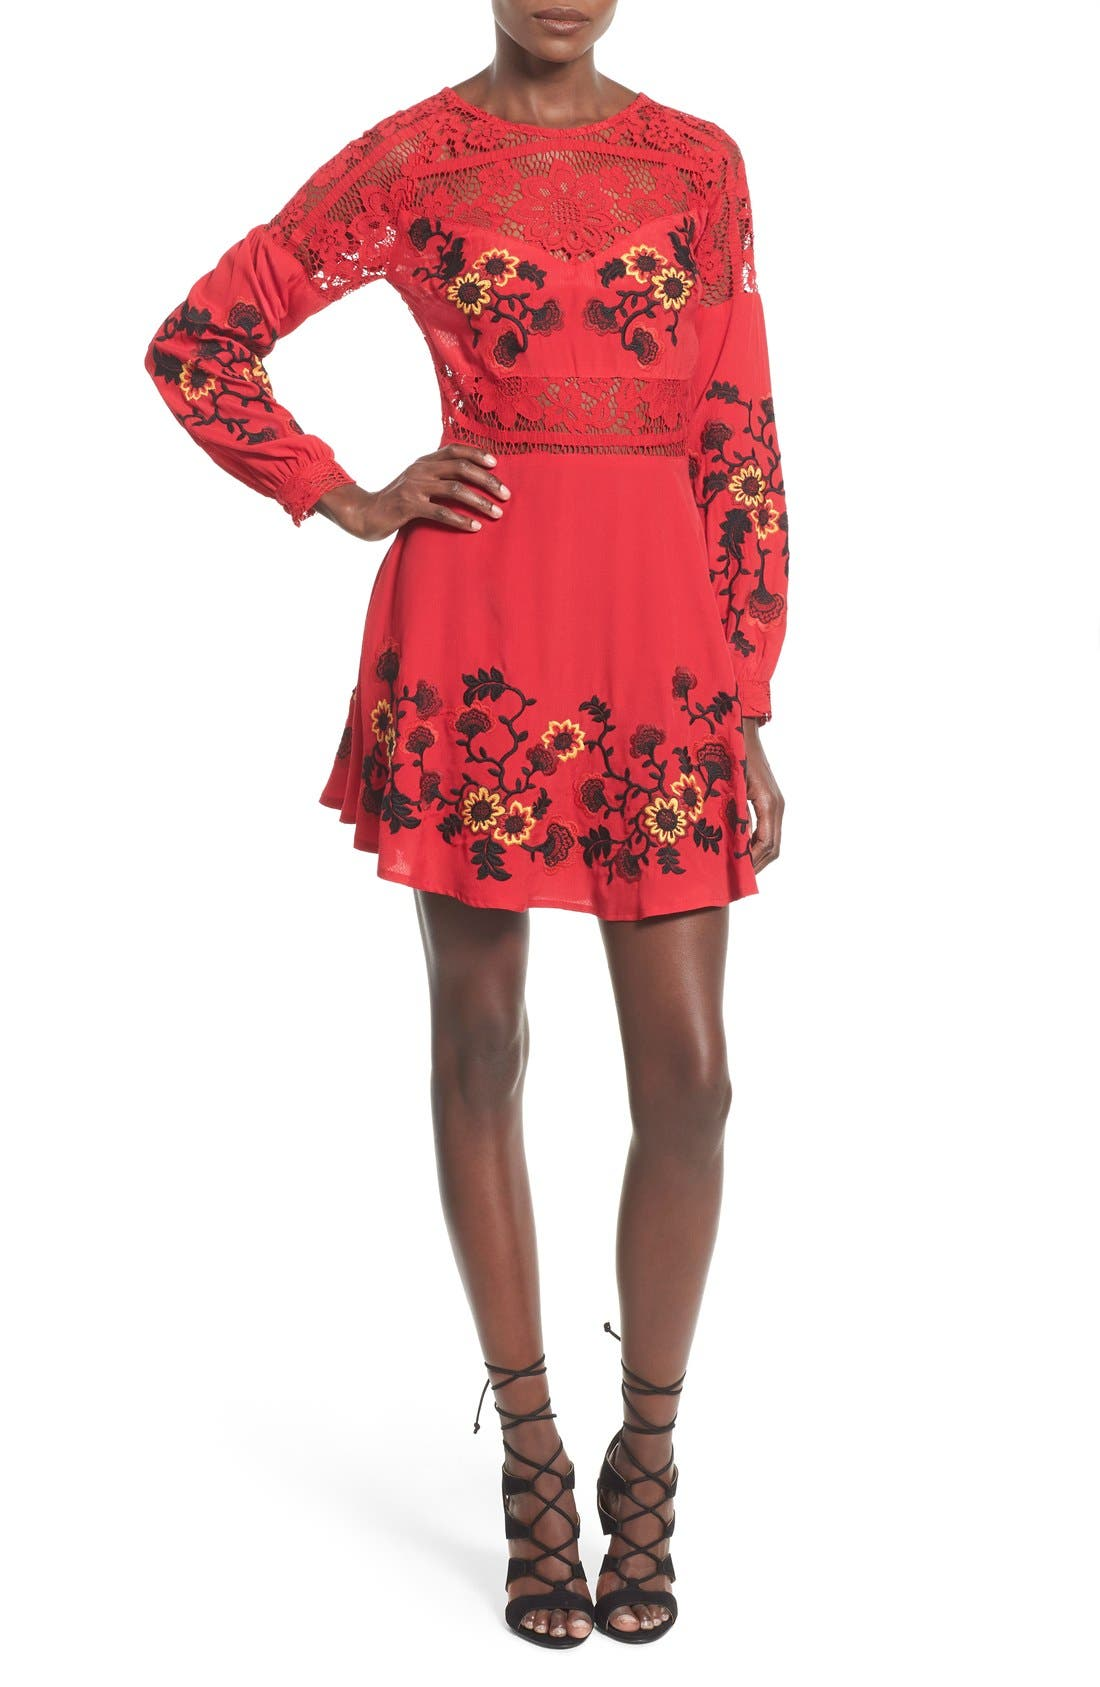 Main Image - For Love & Lemons 'Isabella' Fit & Flare Dress